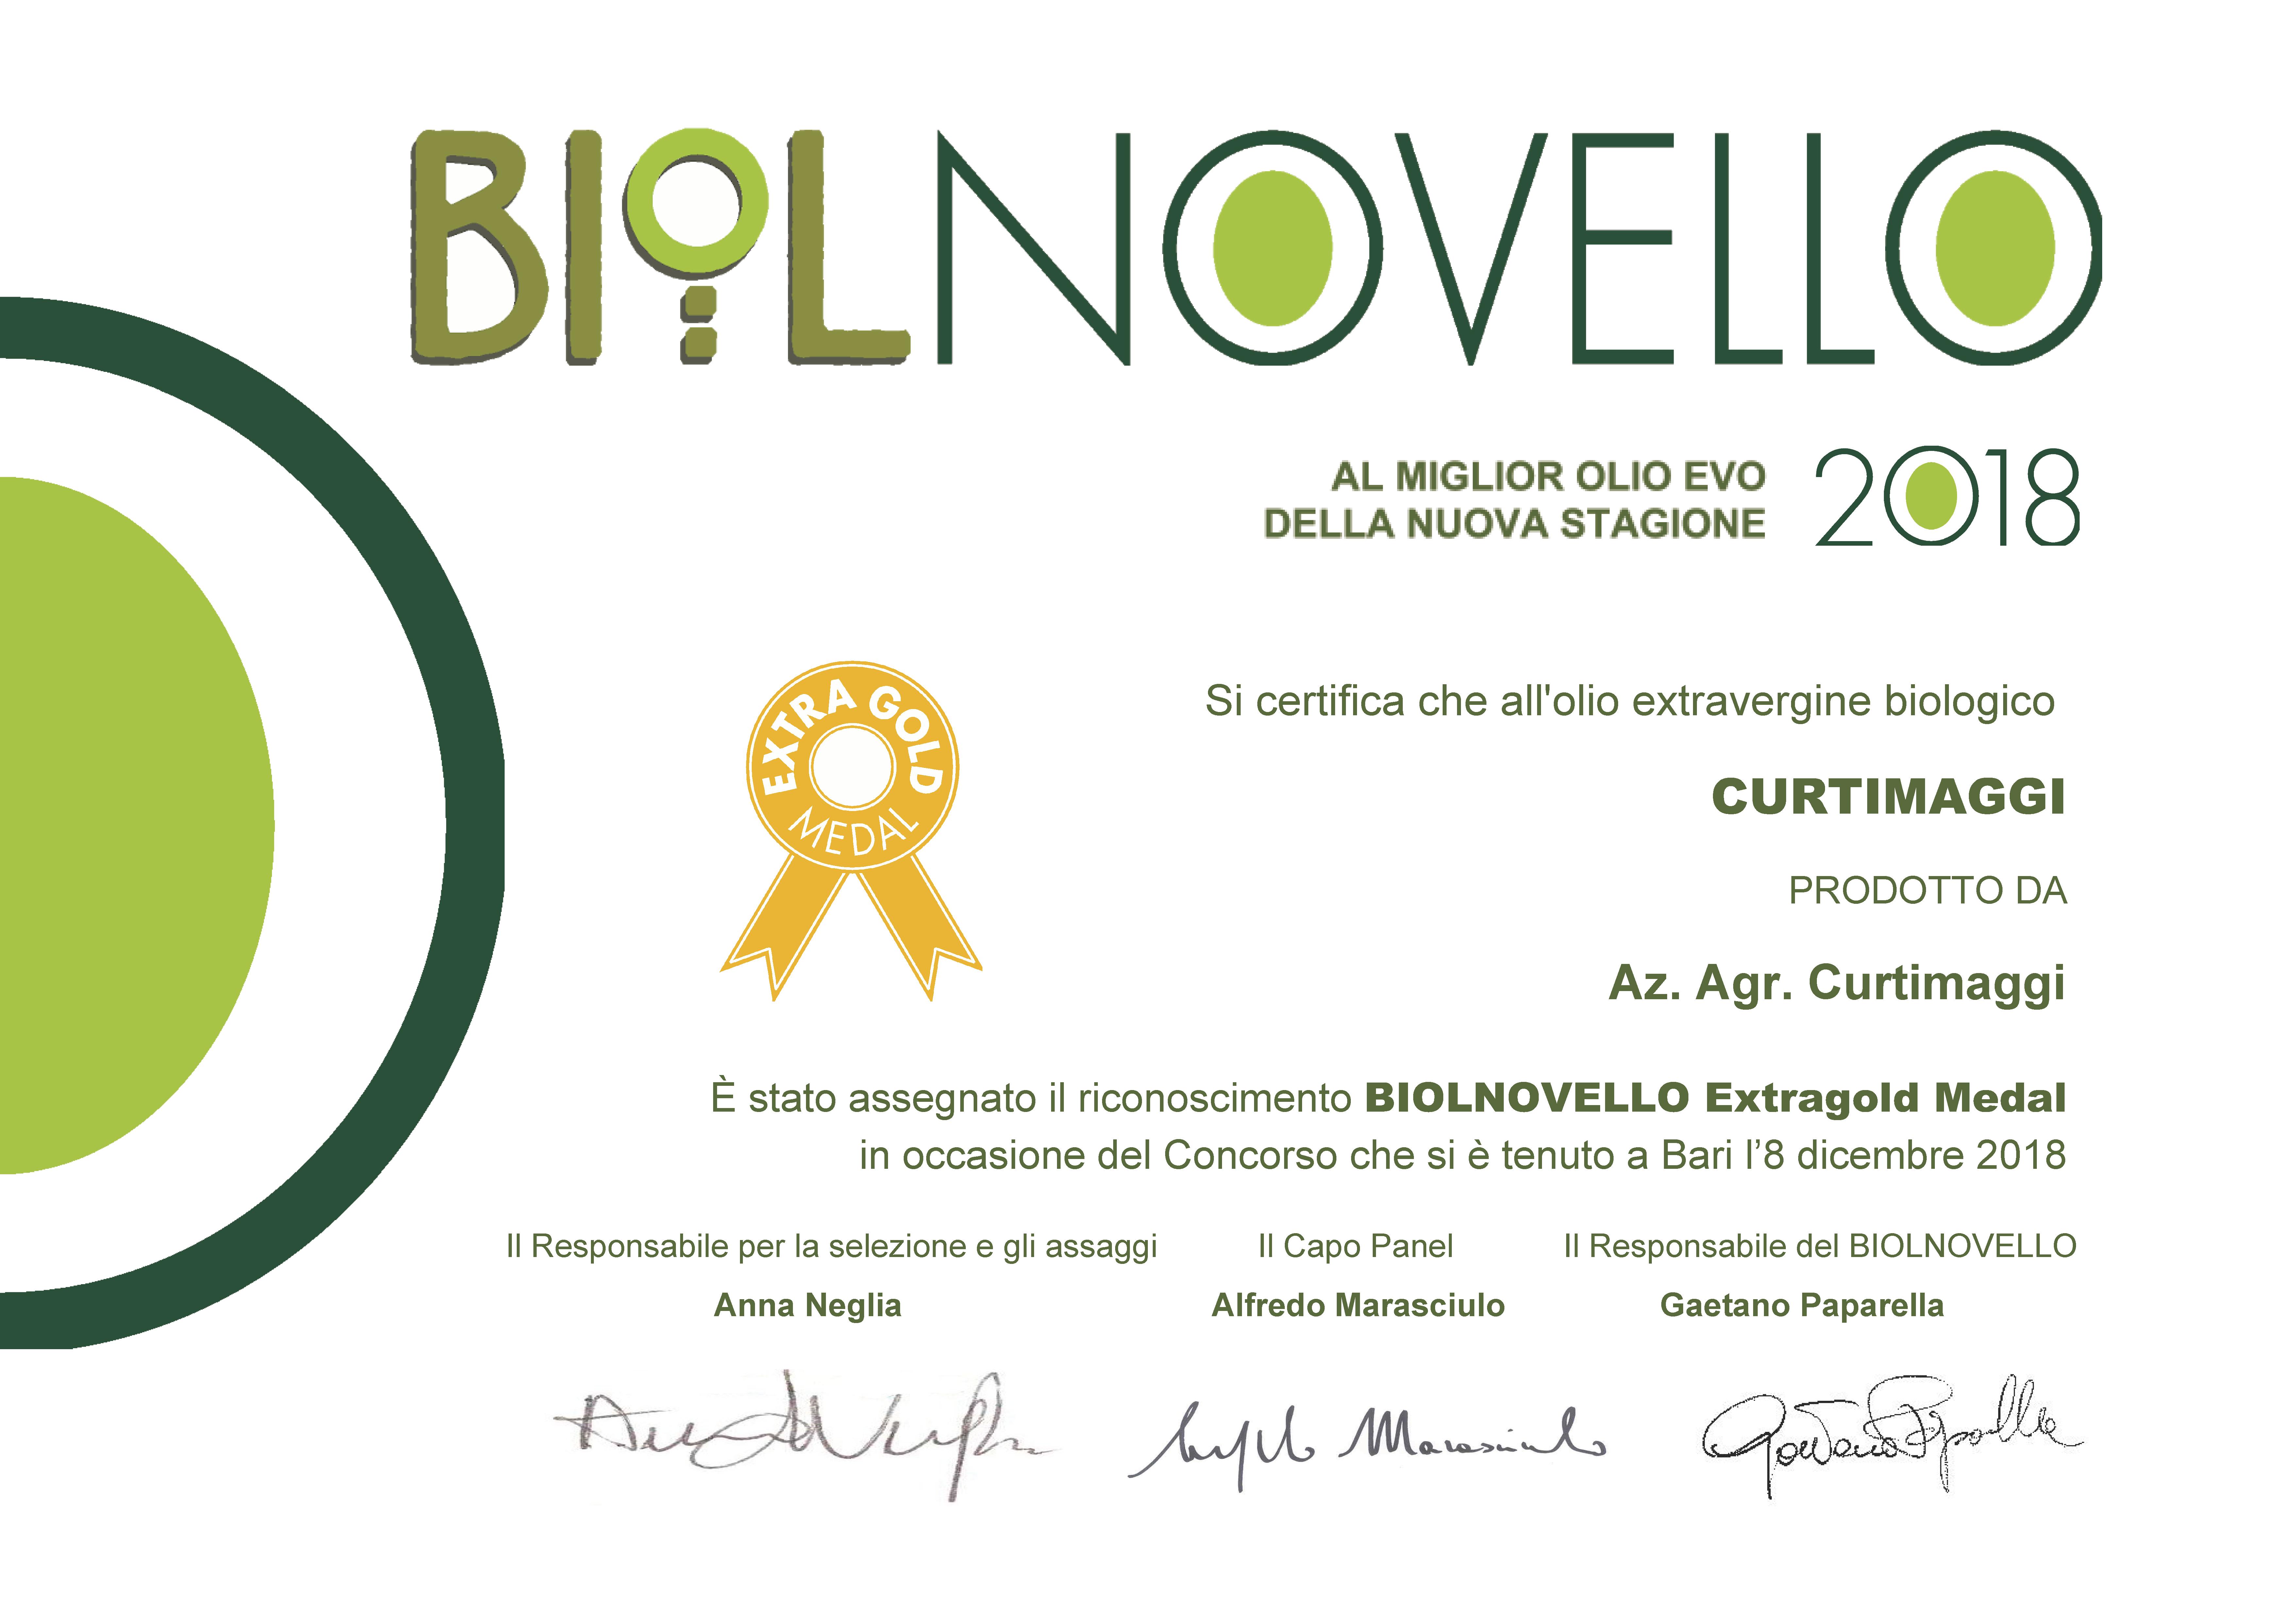 Attestato Biolnovello Az. Agr Curtimaggi Extragold